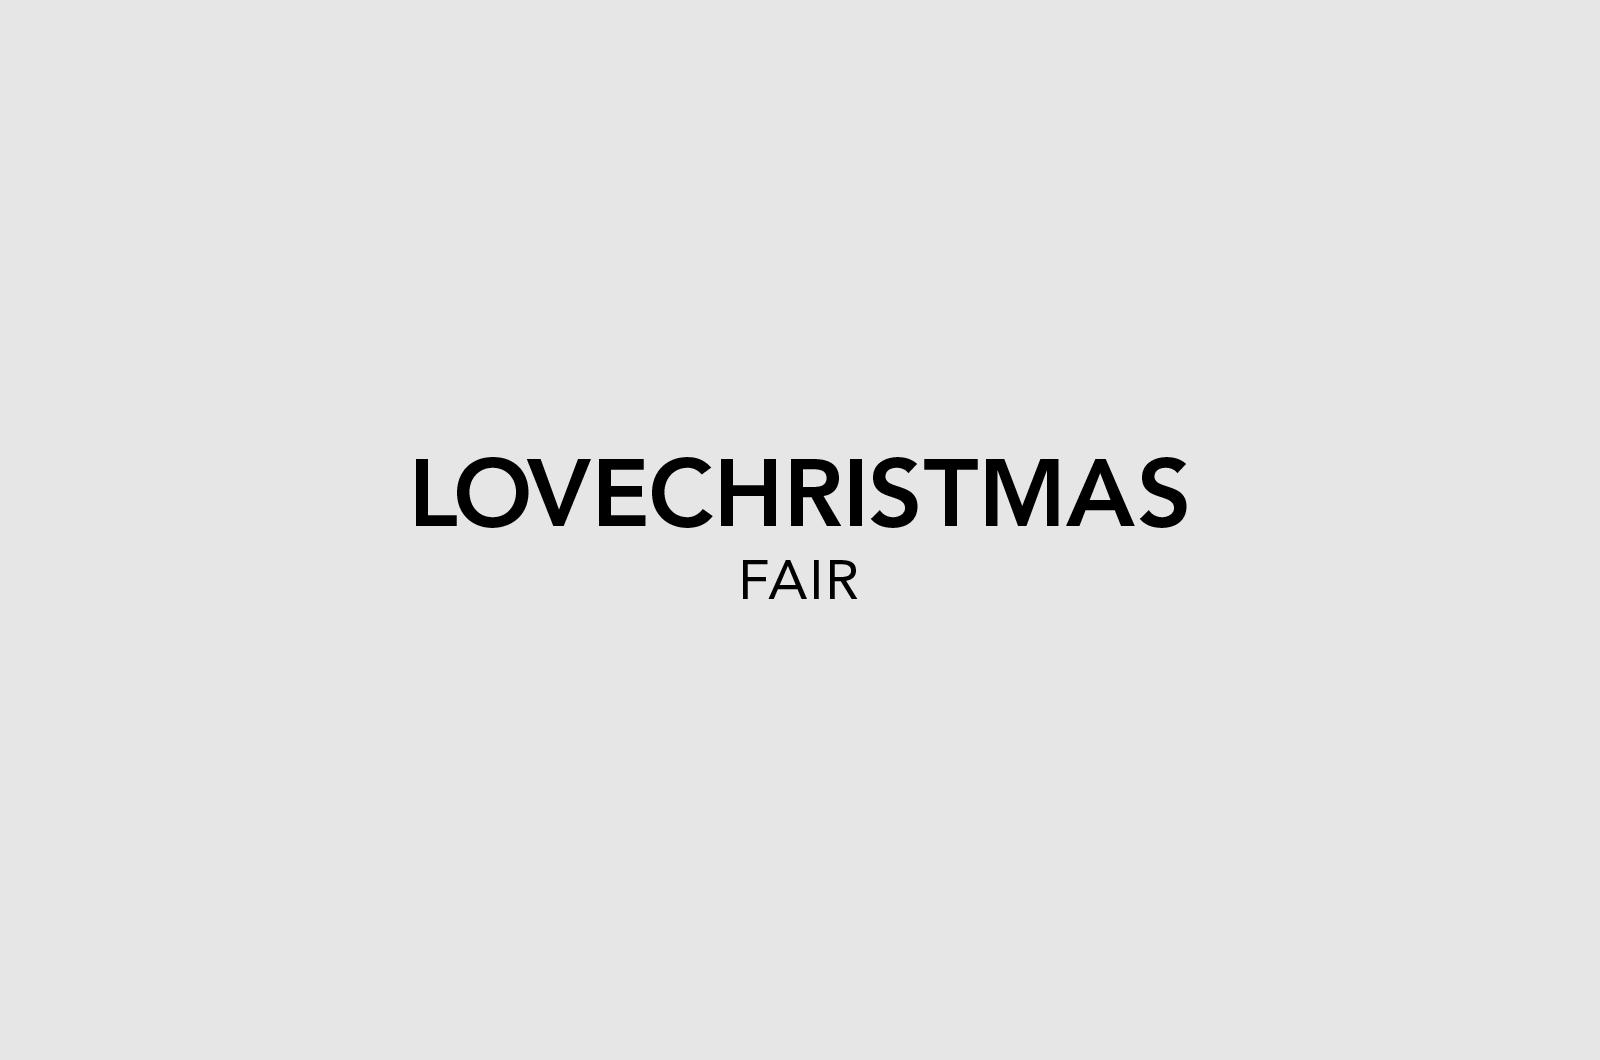 LoveChristmas Brand 01 - Logotype